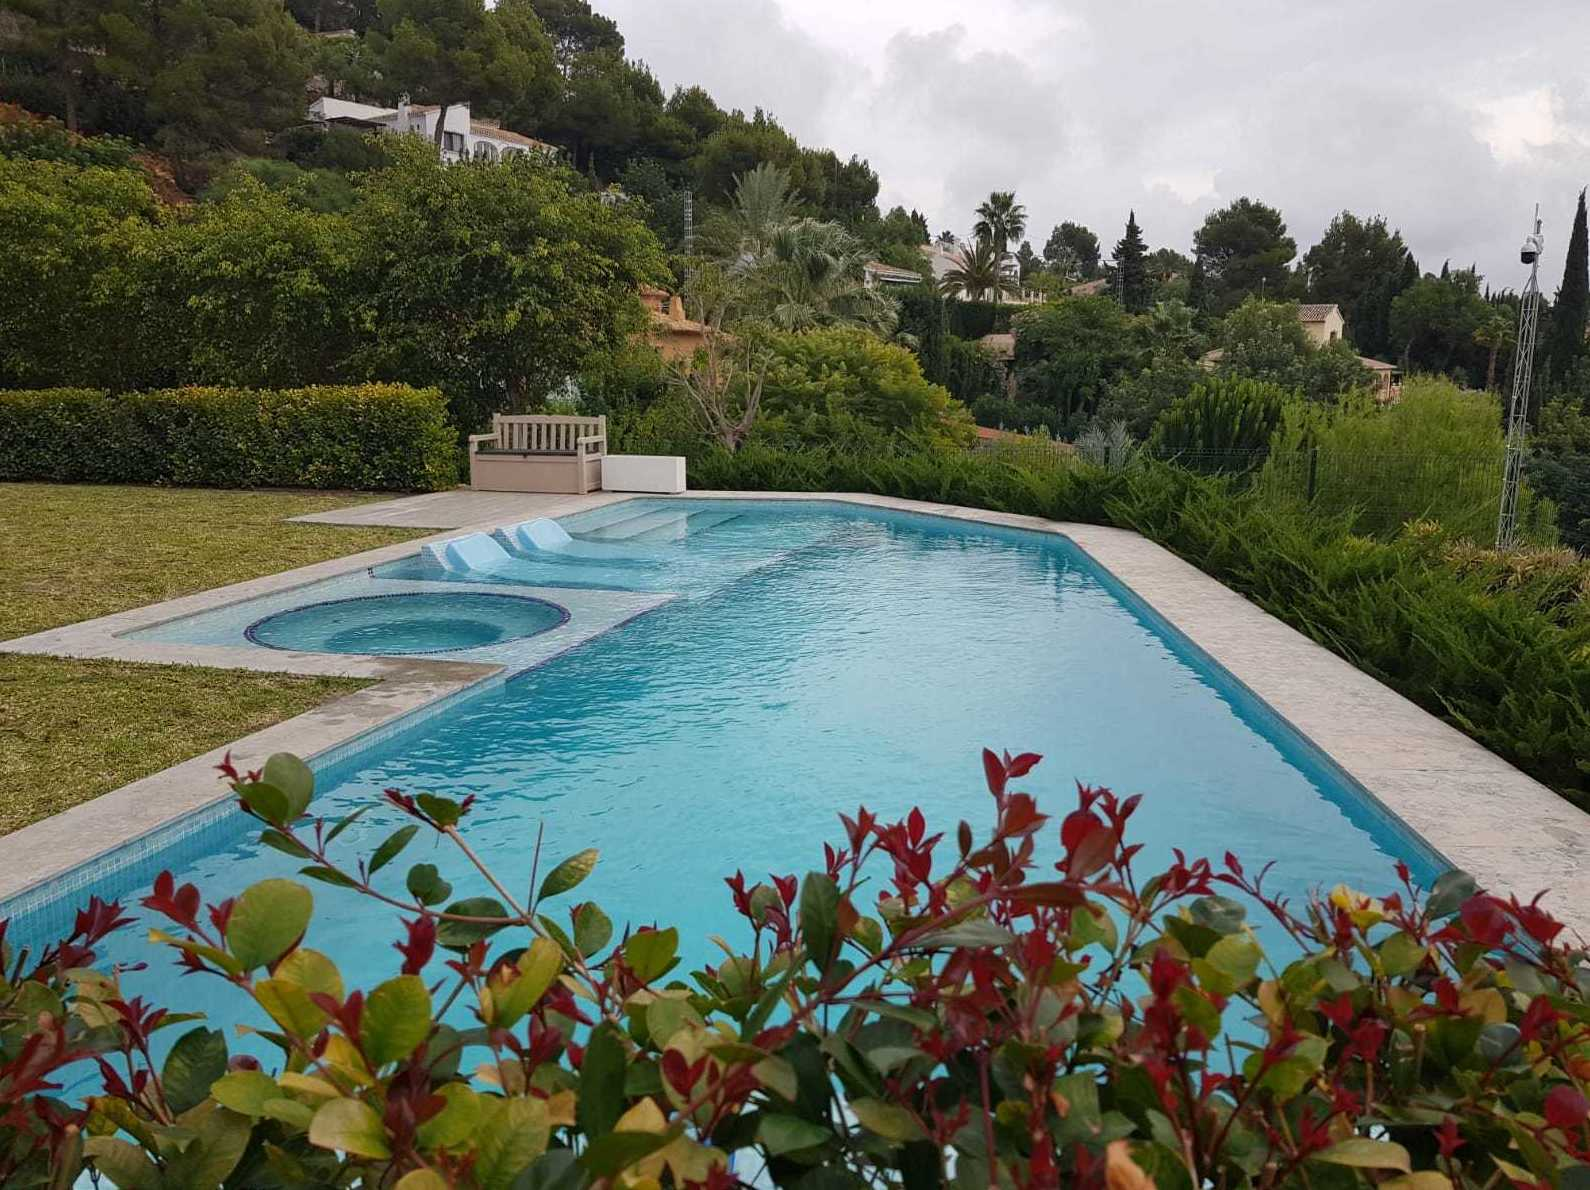 Foto 24 de Instalación de piscinas en    Aiguanet Garden & Pool